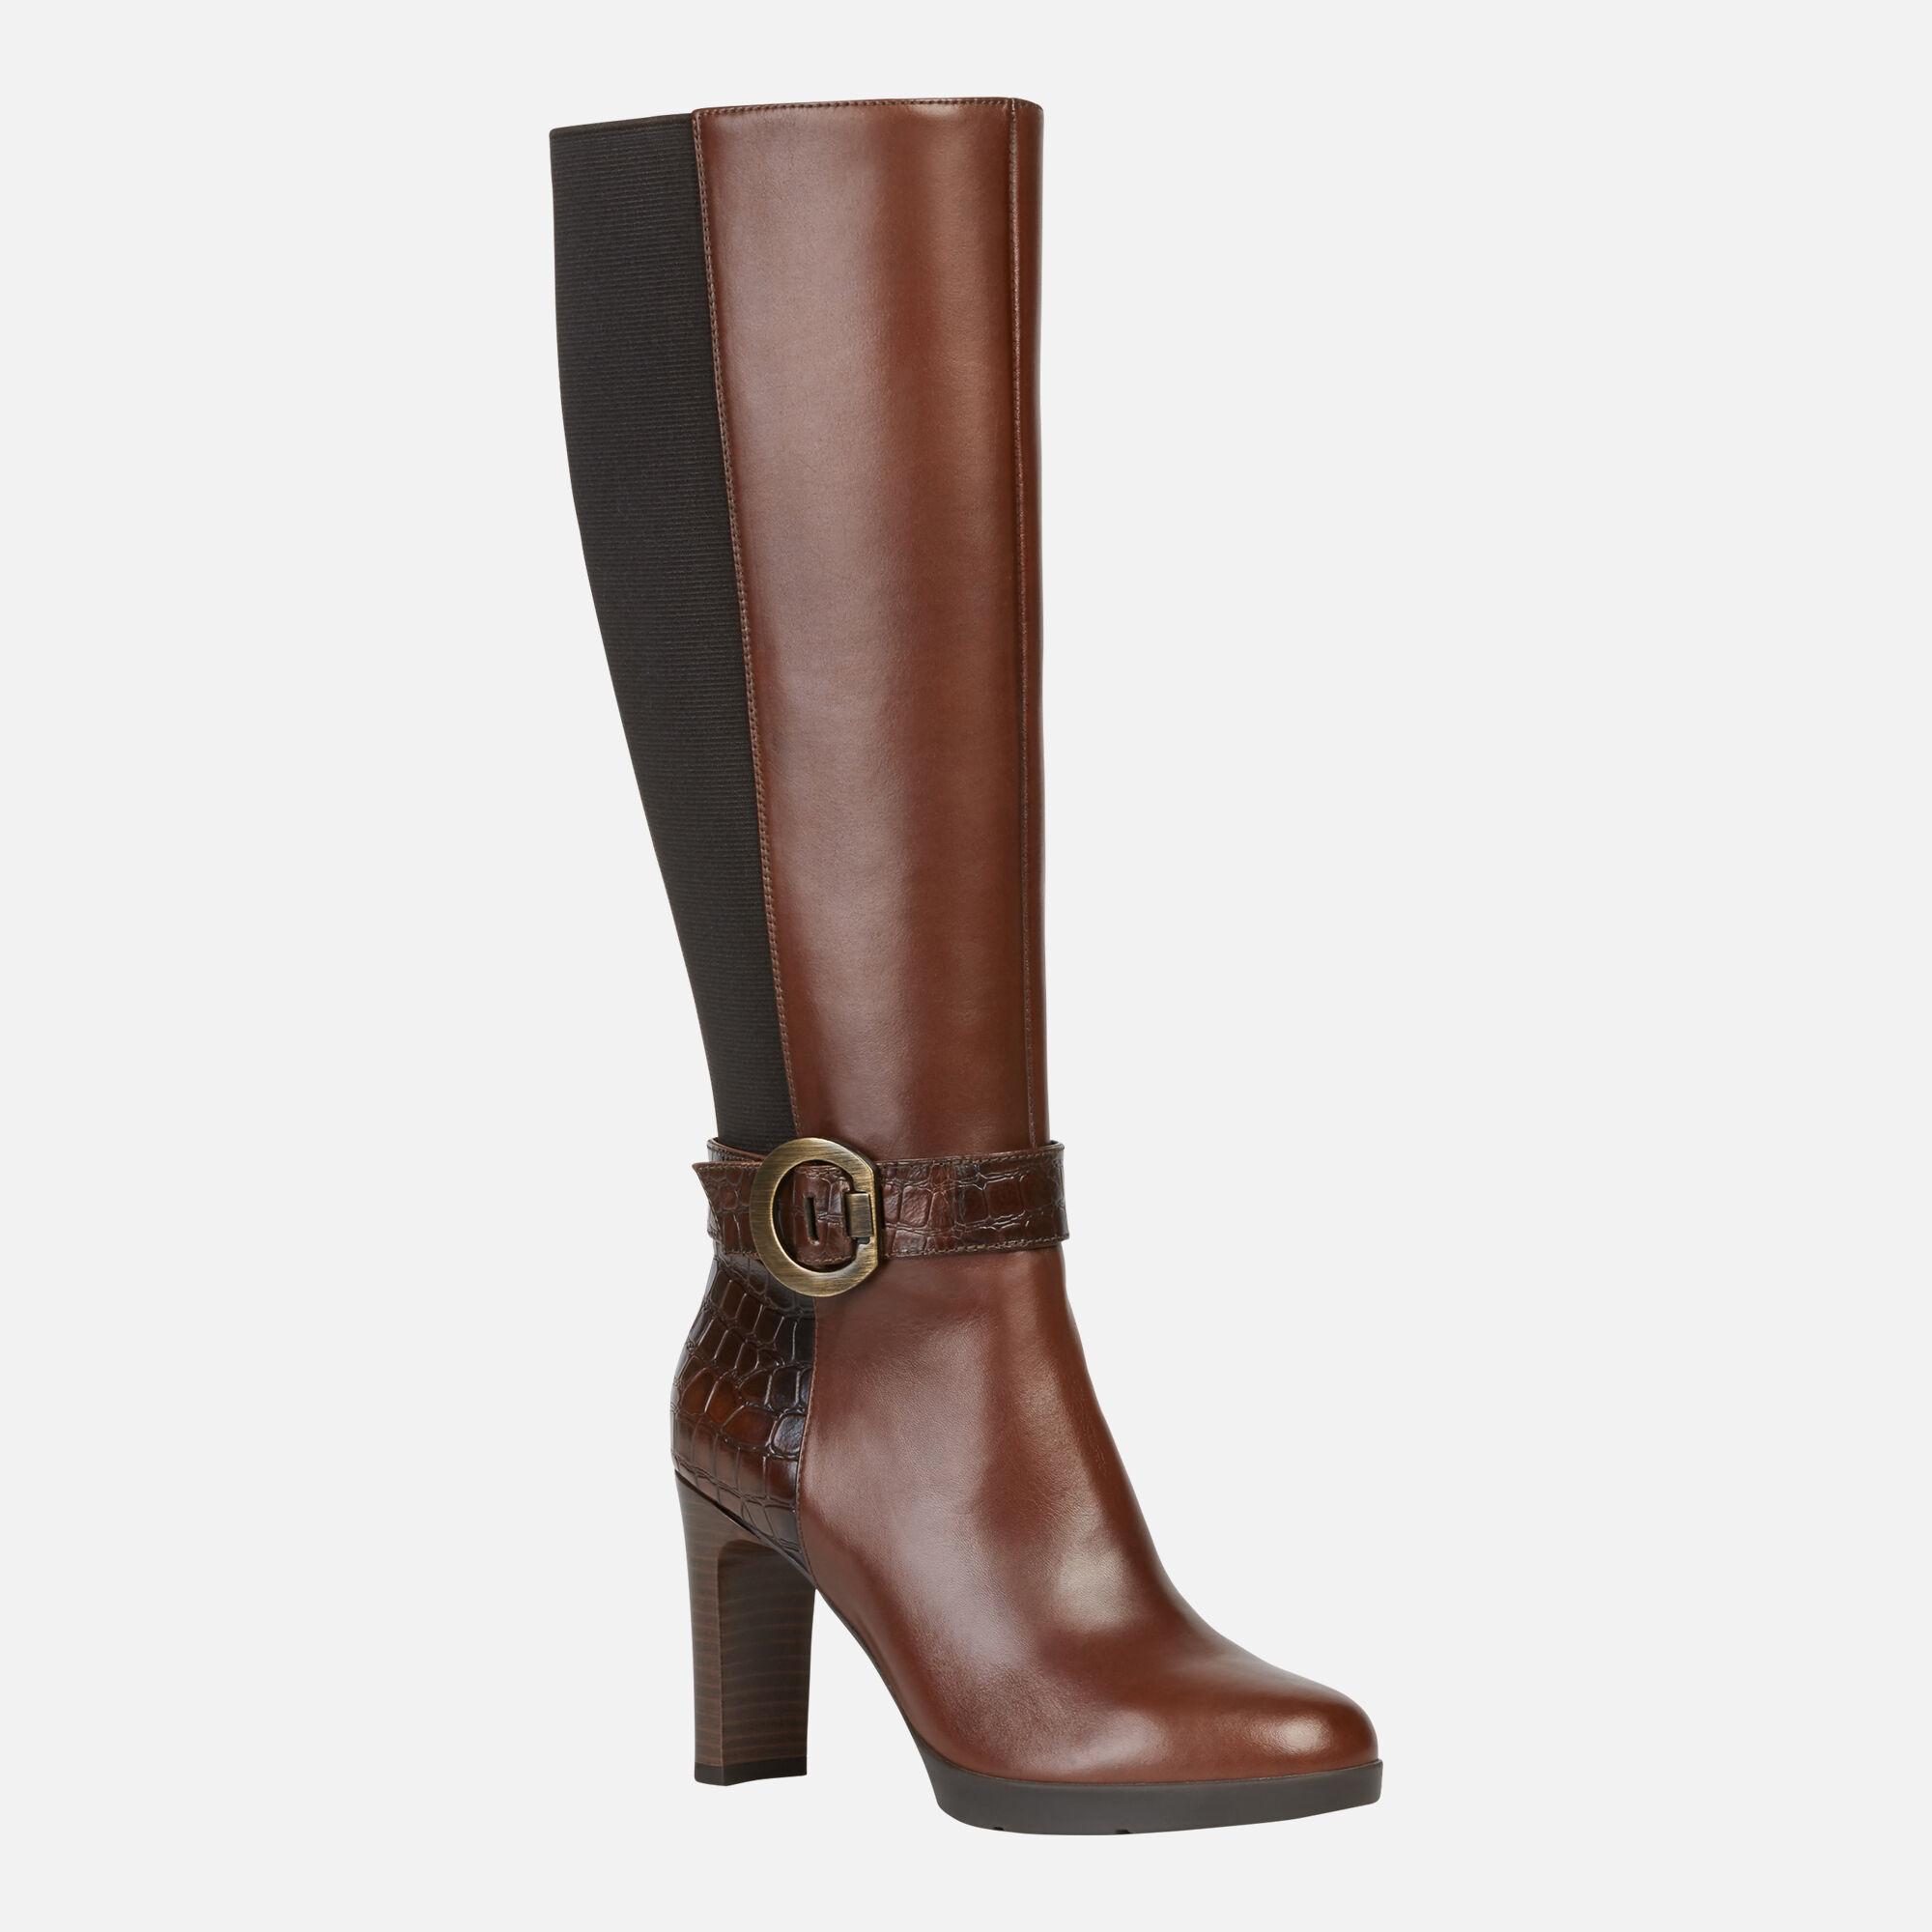 comprar marca Geox UK Talla 6 marrón Leather Knee High botas